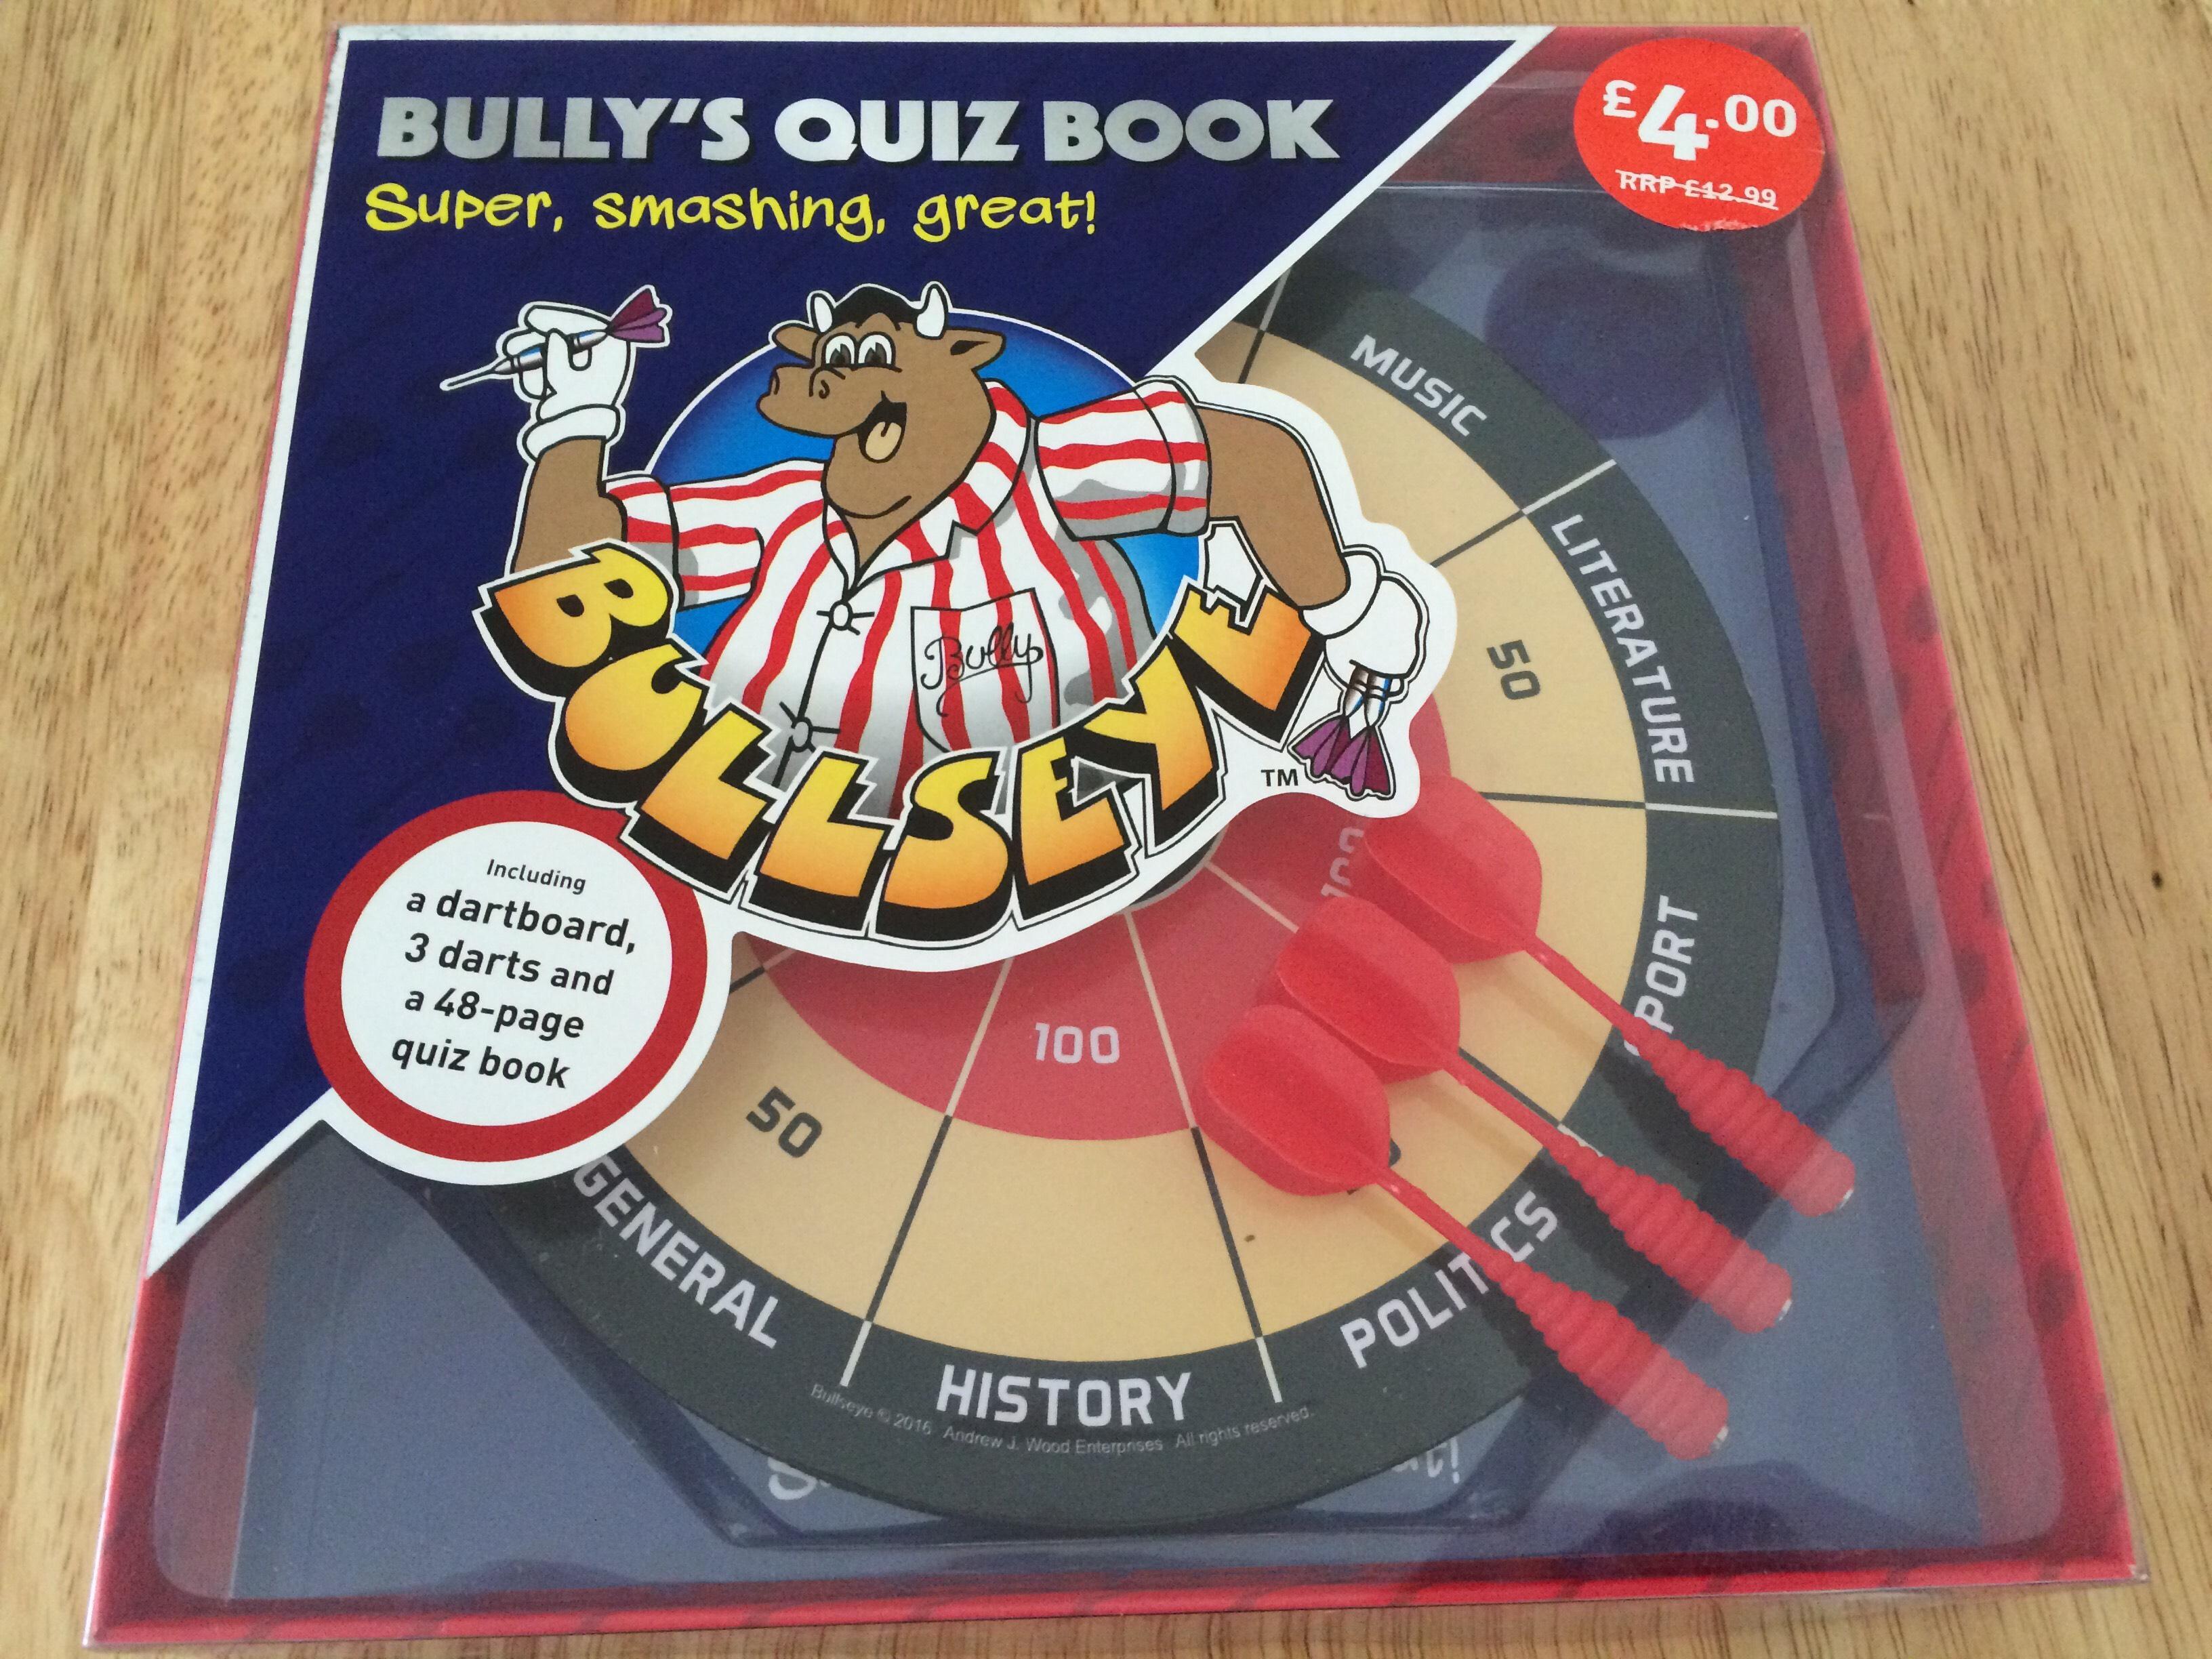 Bullseye Quiz Book £2 @ The food warehouse